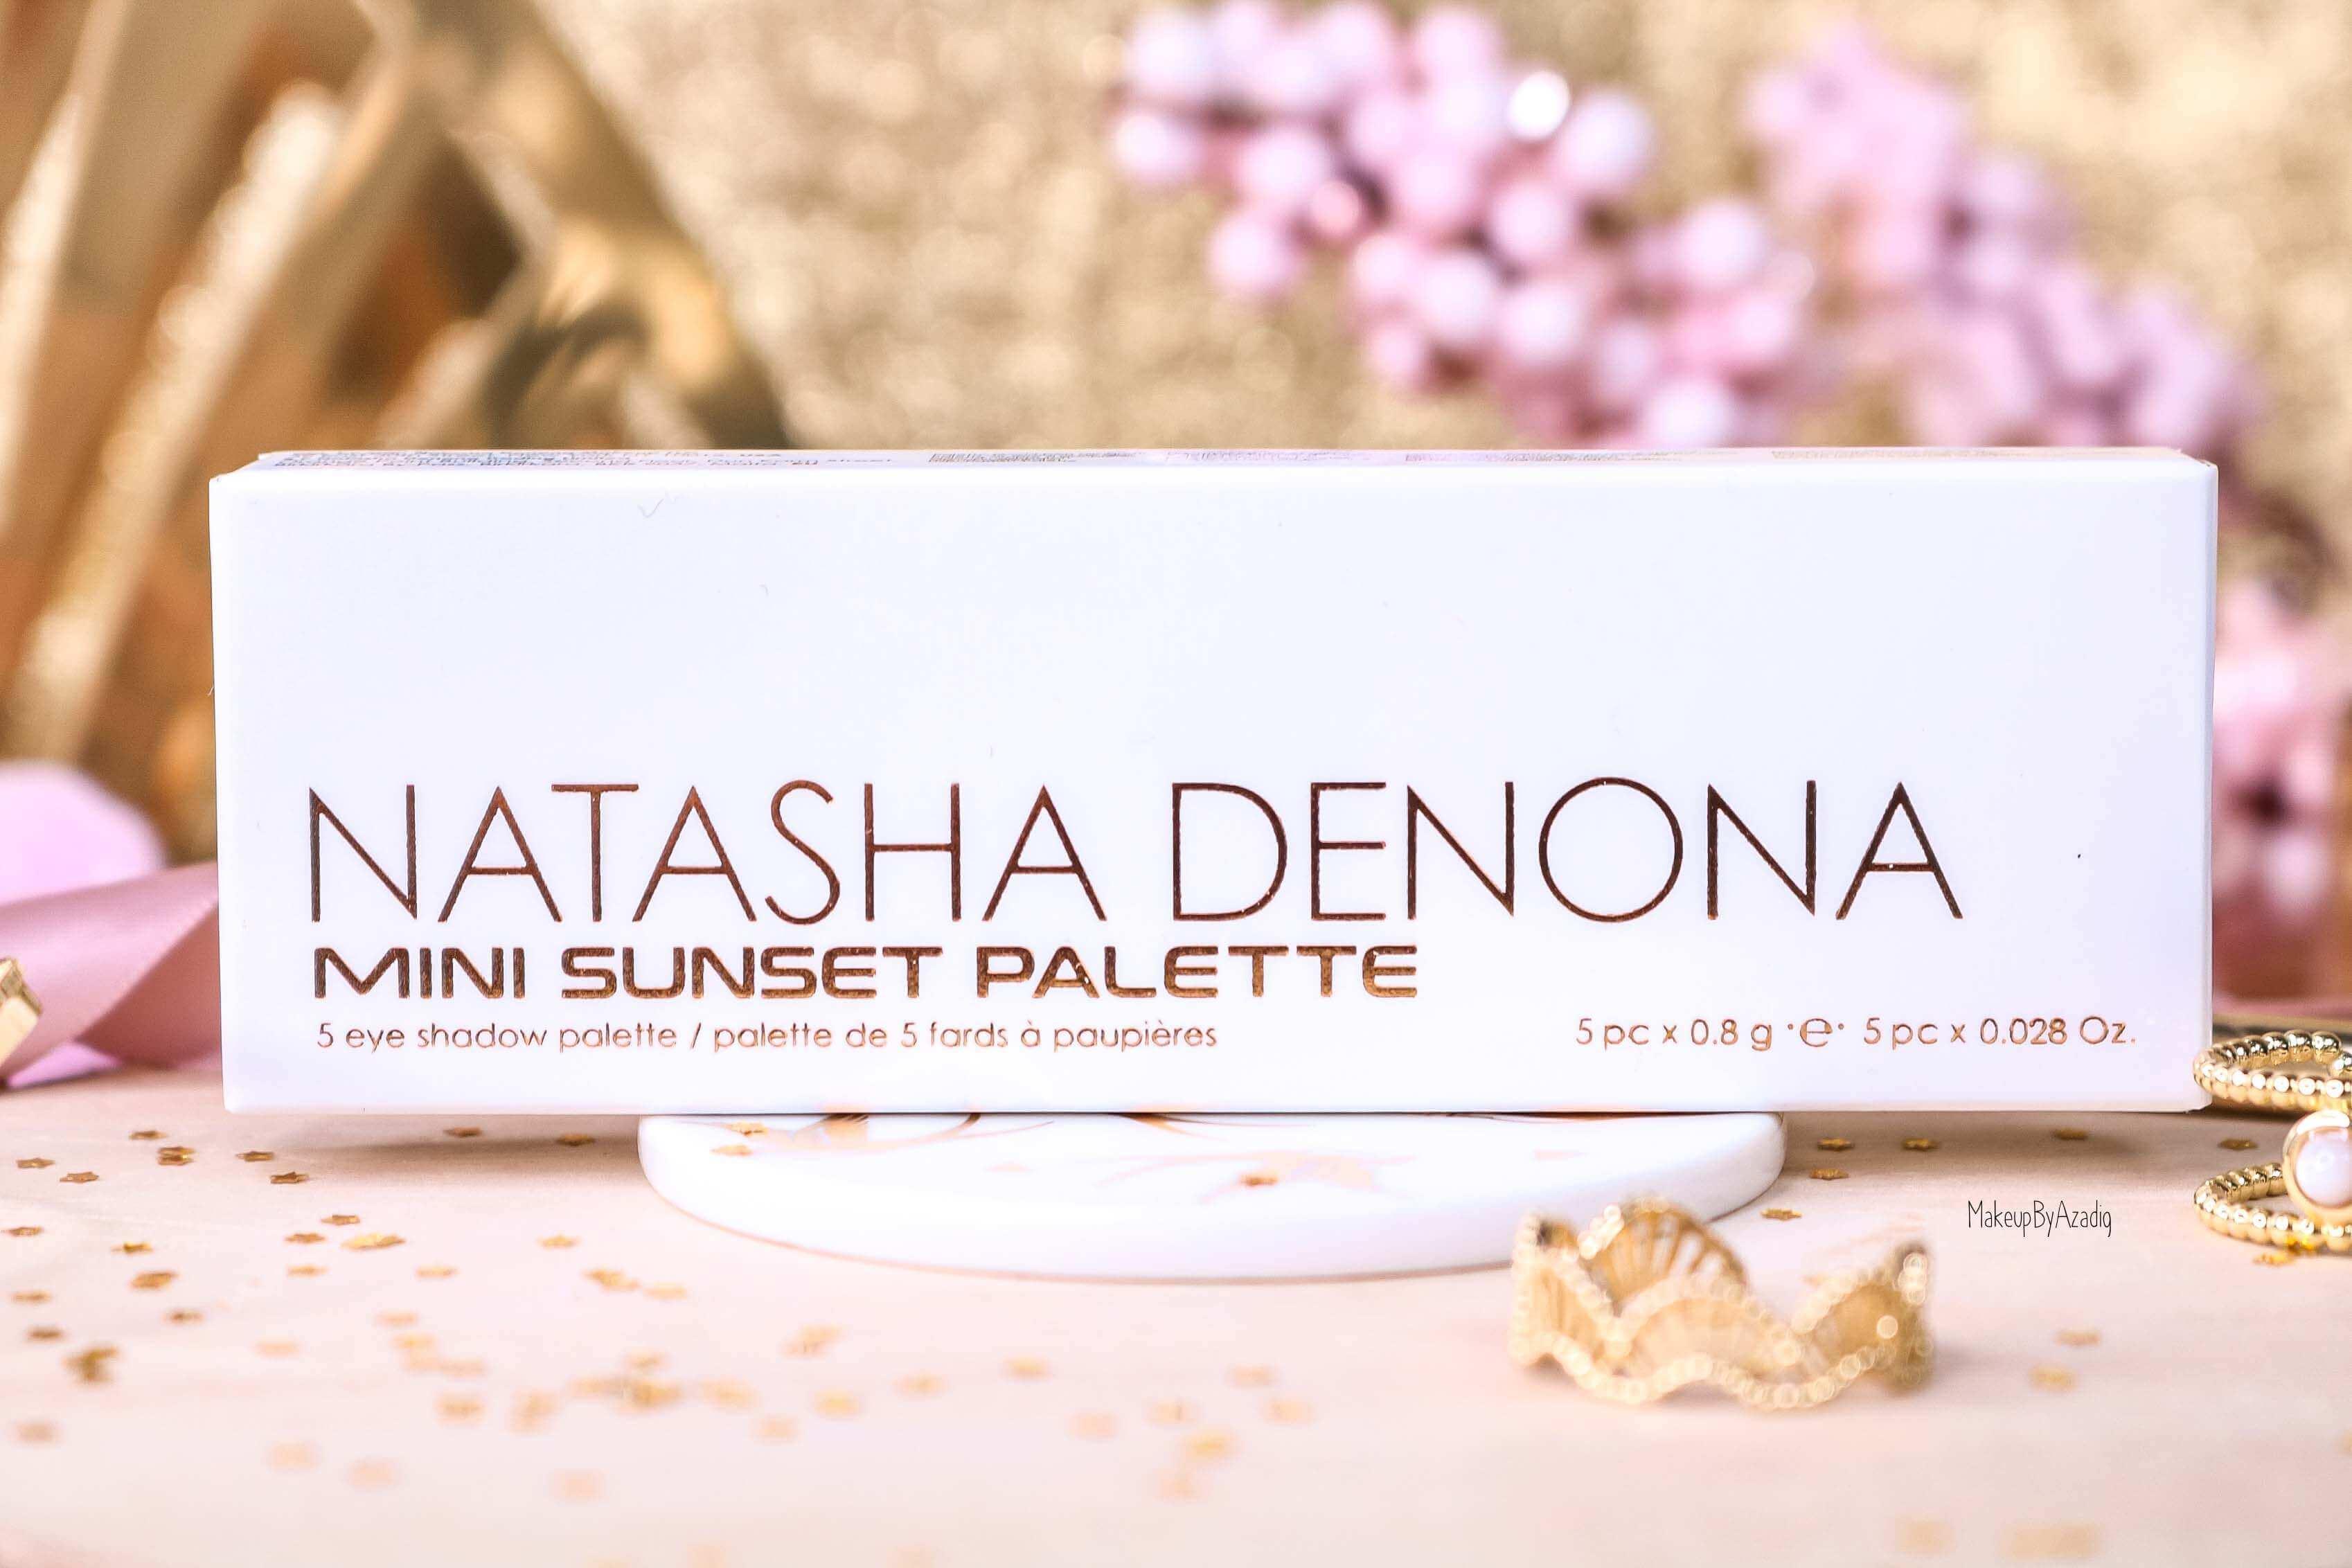 revue-palette-mini-sunset-natasha-denona-sephora-france-avis-prix-swatch-gold-champagne-burgundy-makeupbyazadig-eyeshadow-packaging